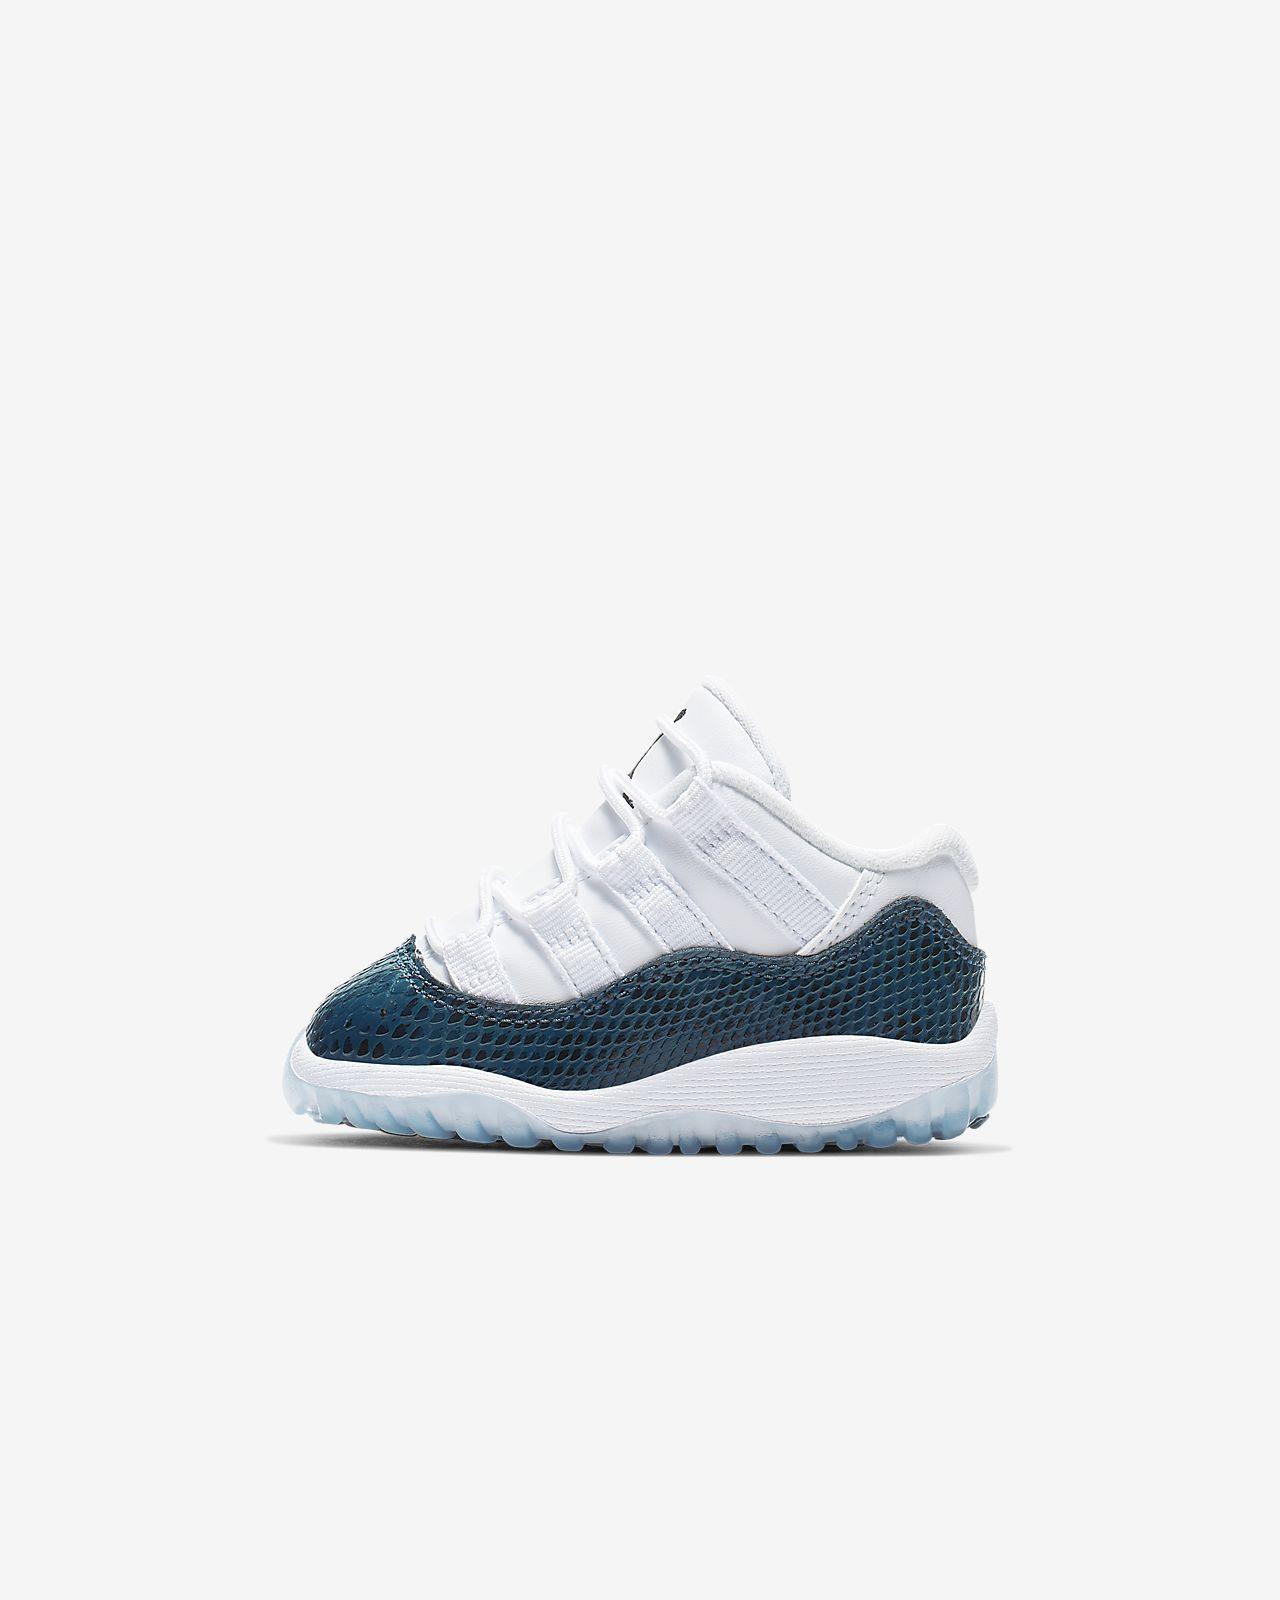 Jordan 11 Retro LowLE (TD)复刻婴童运动童鞋